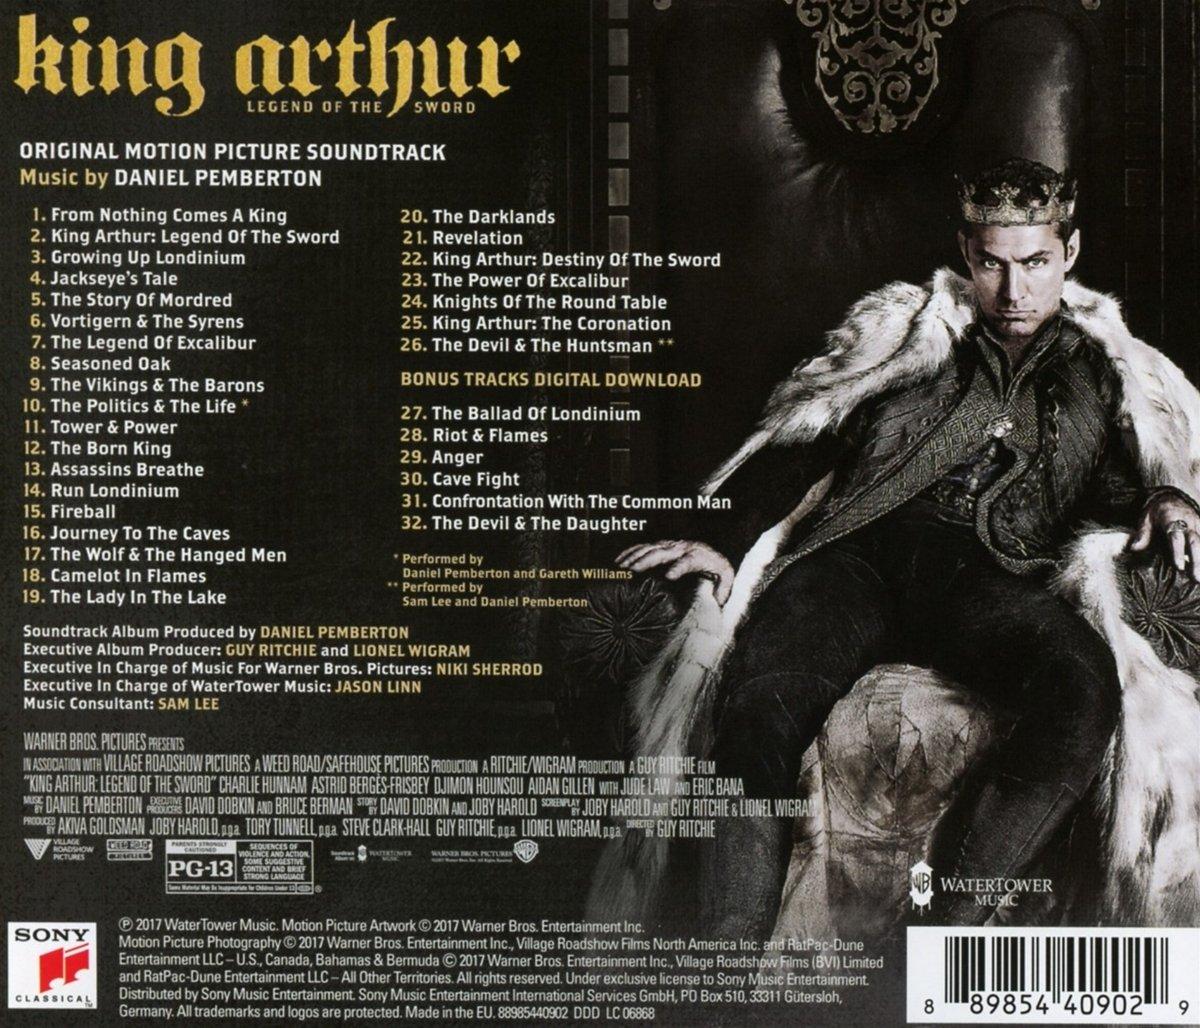 king arthur legend of the sword original motion picture